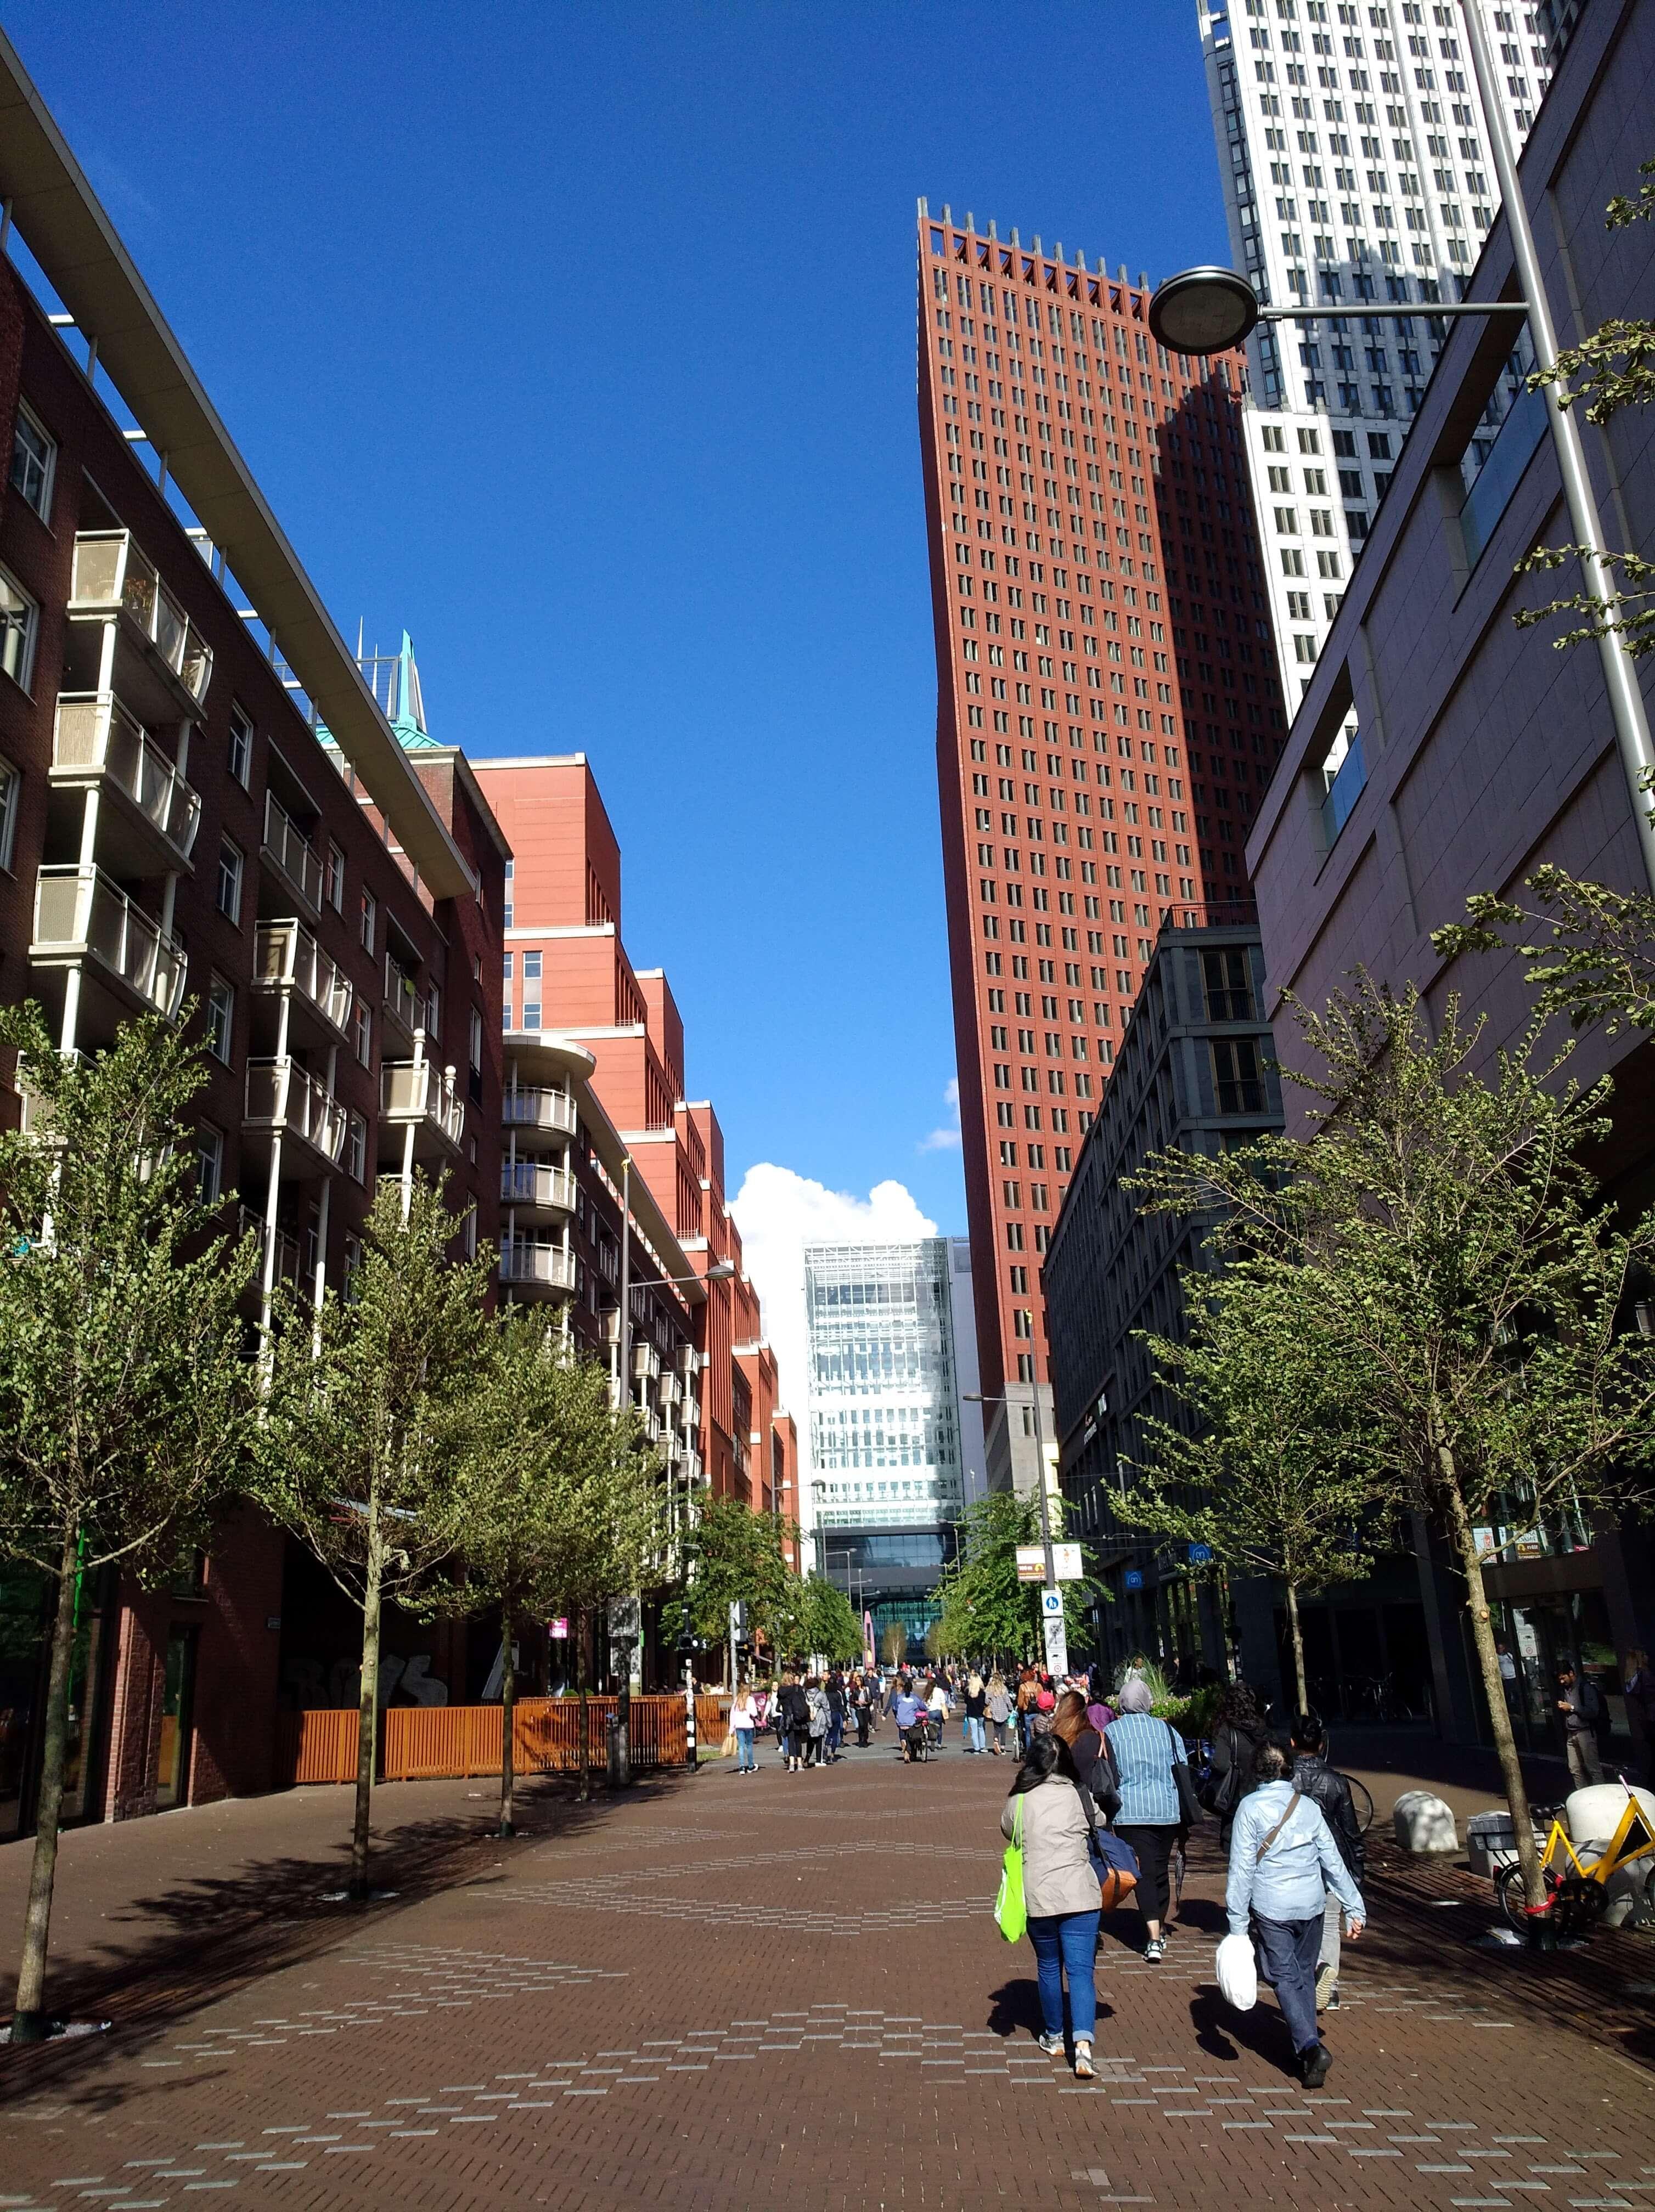 Visiter La Haye: lieux à visiter, hôtels, restaurants, transports, bons plans